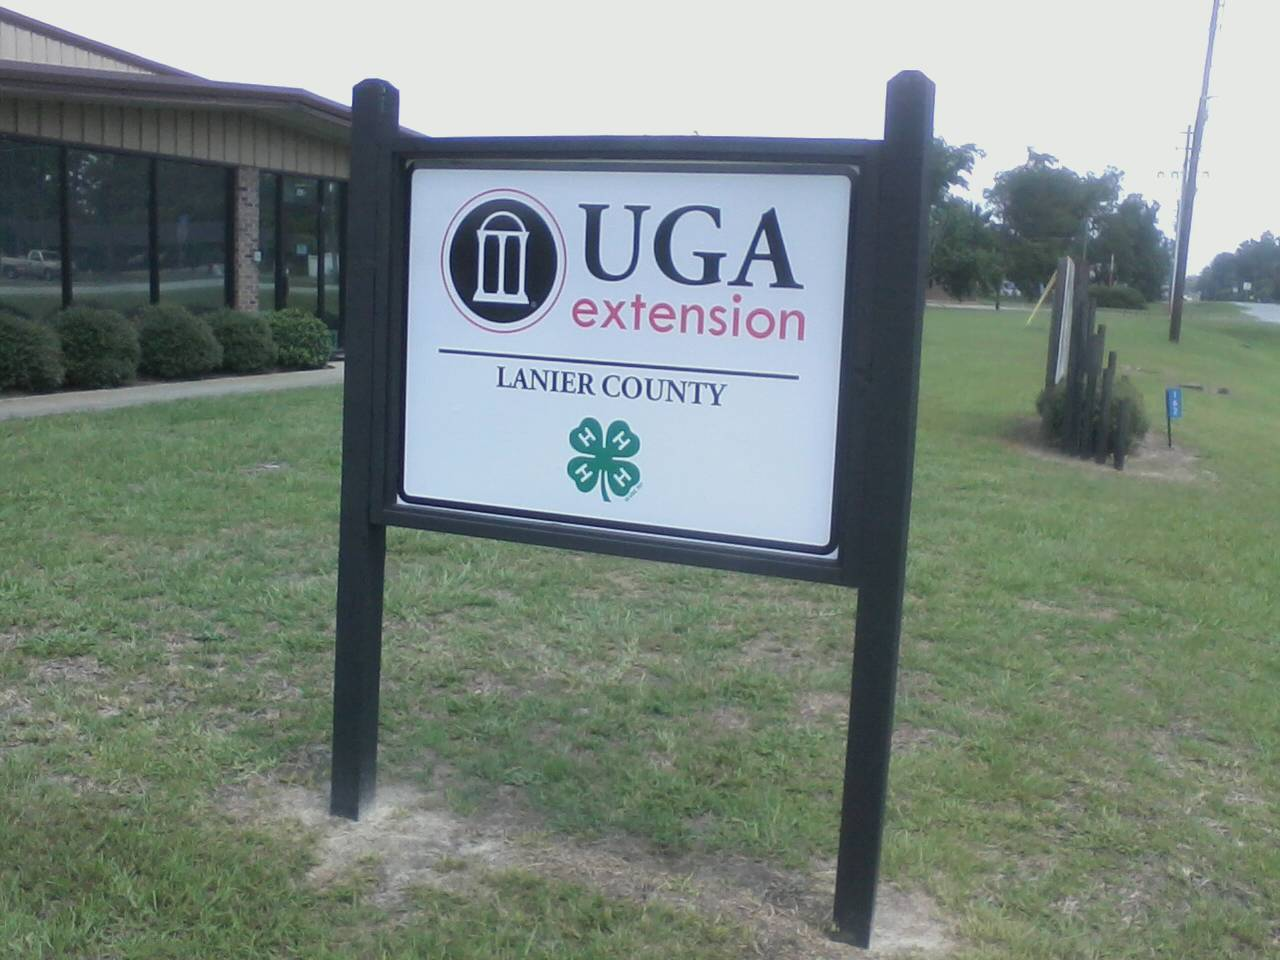 UGA Extension sign